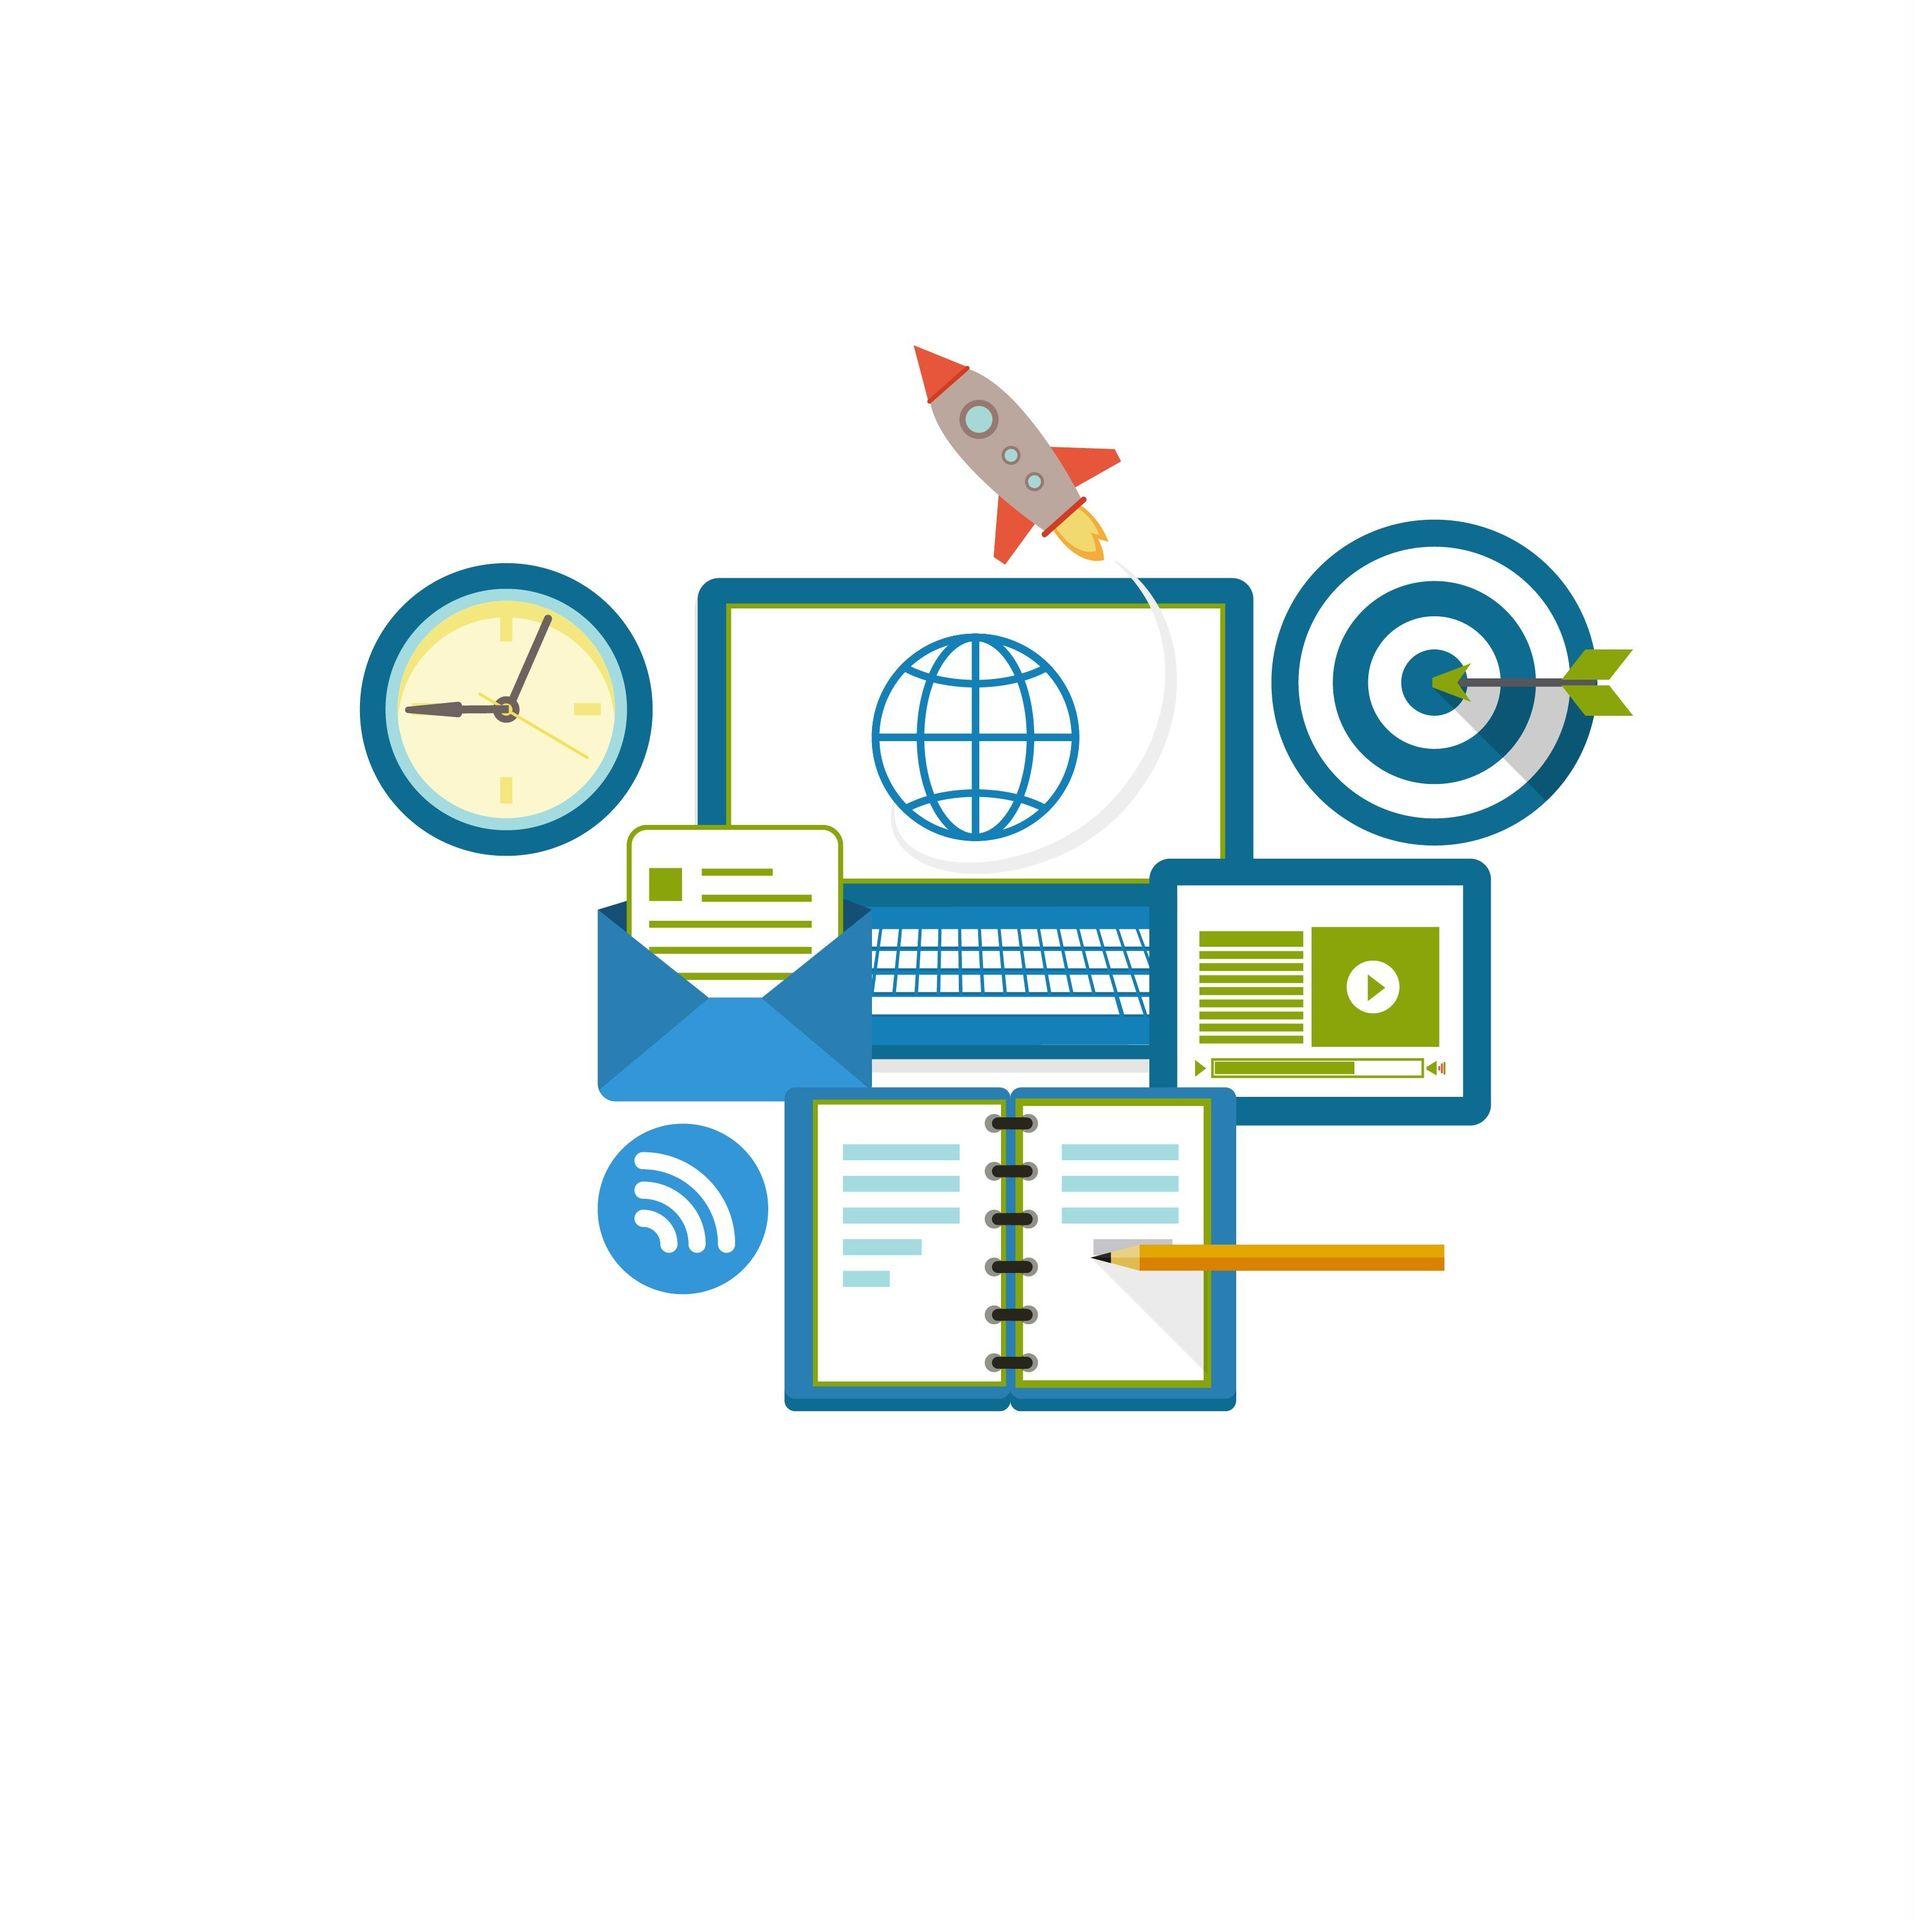 vbout-marketing-course-body-img-digital-marketing